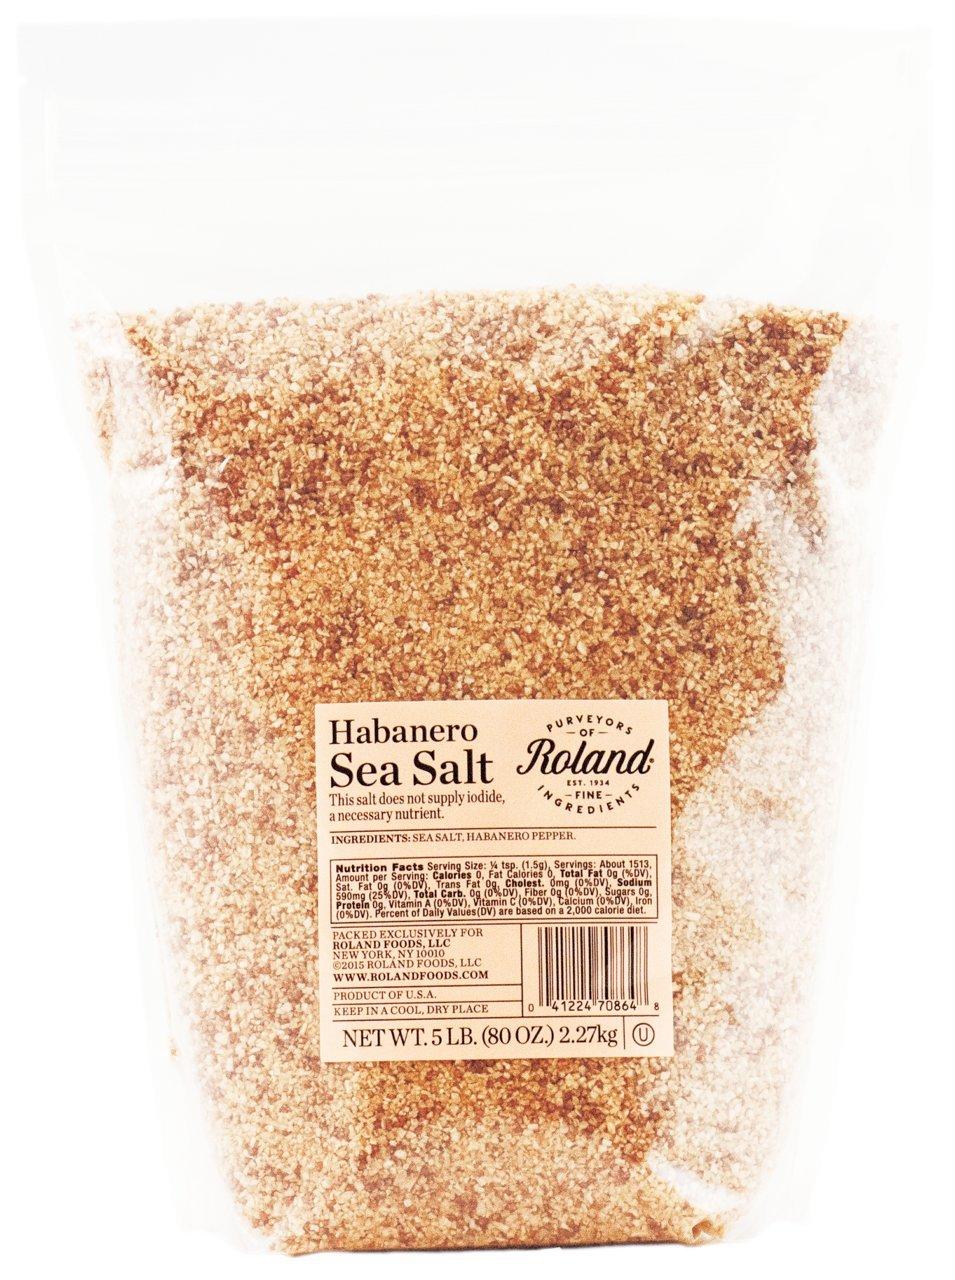 Roland Foods Sea Salt, Habanero, 5 Pound